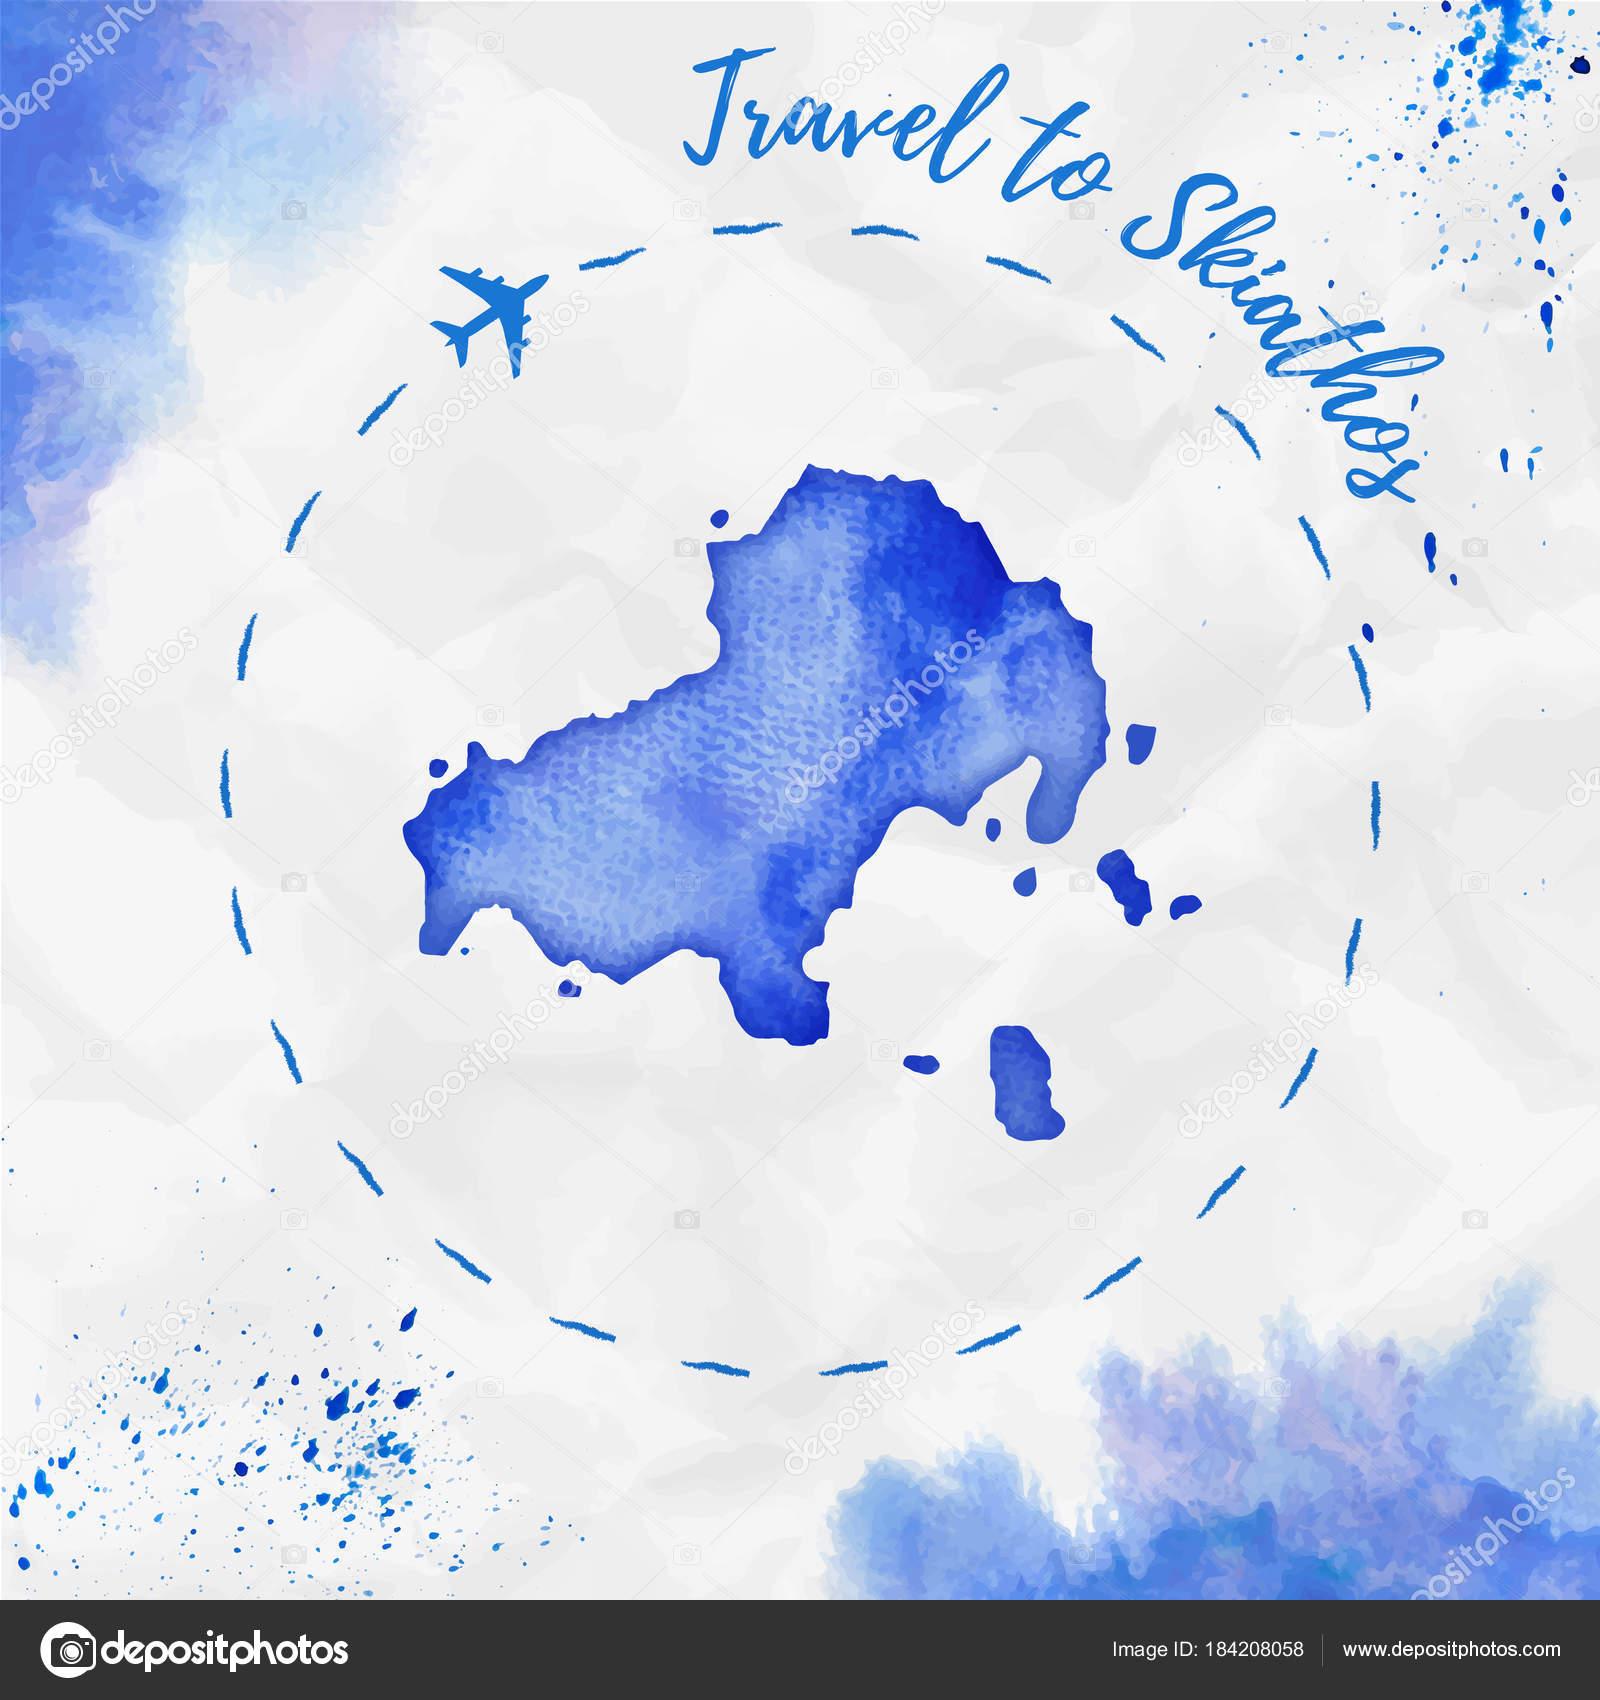 Skiathos watercolor island map in blue colors Travel to Skiathos